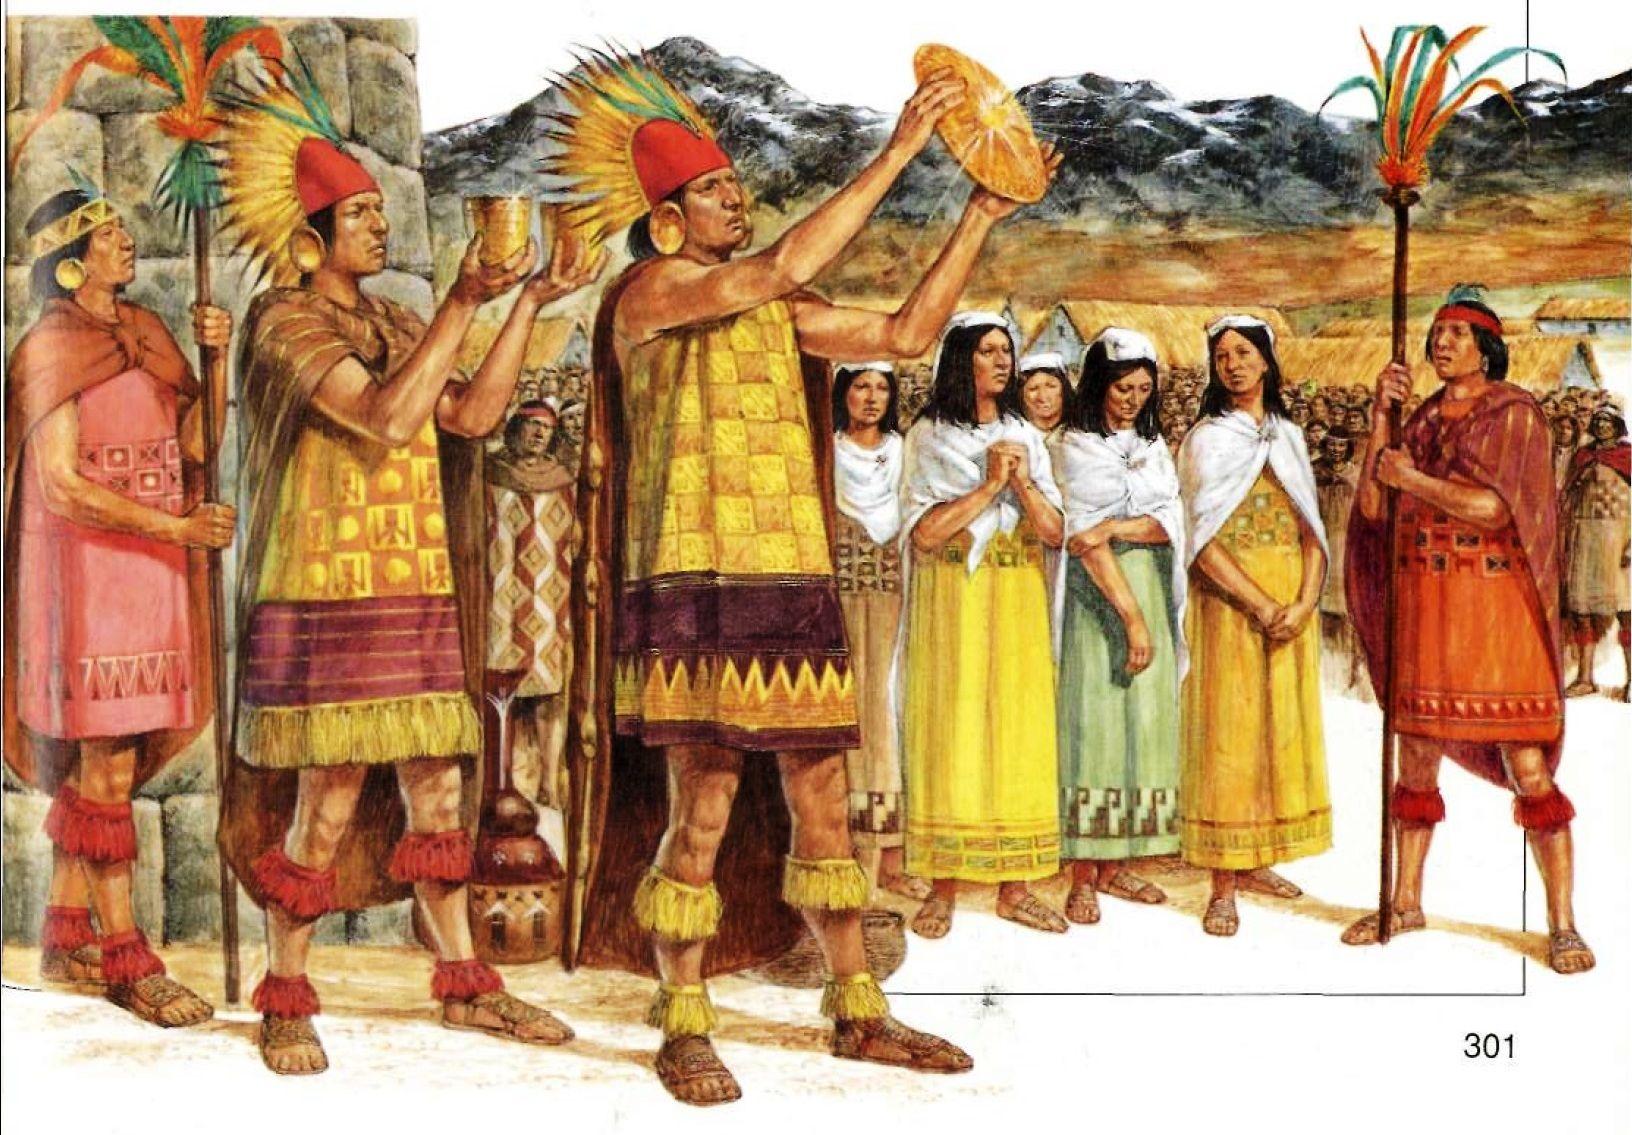 Richard Hook The Incas